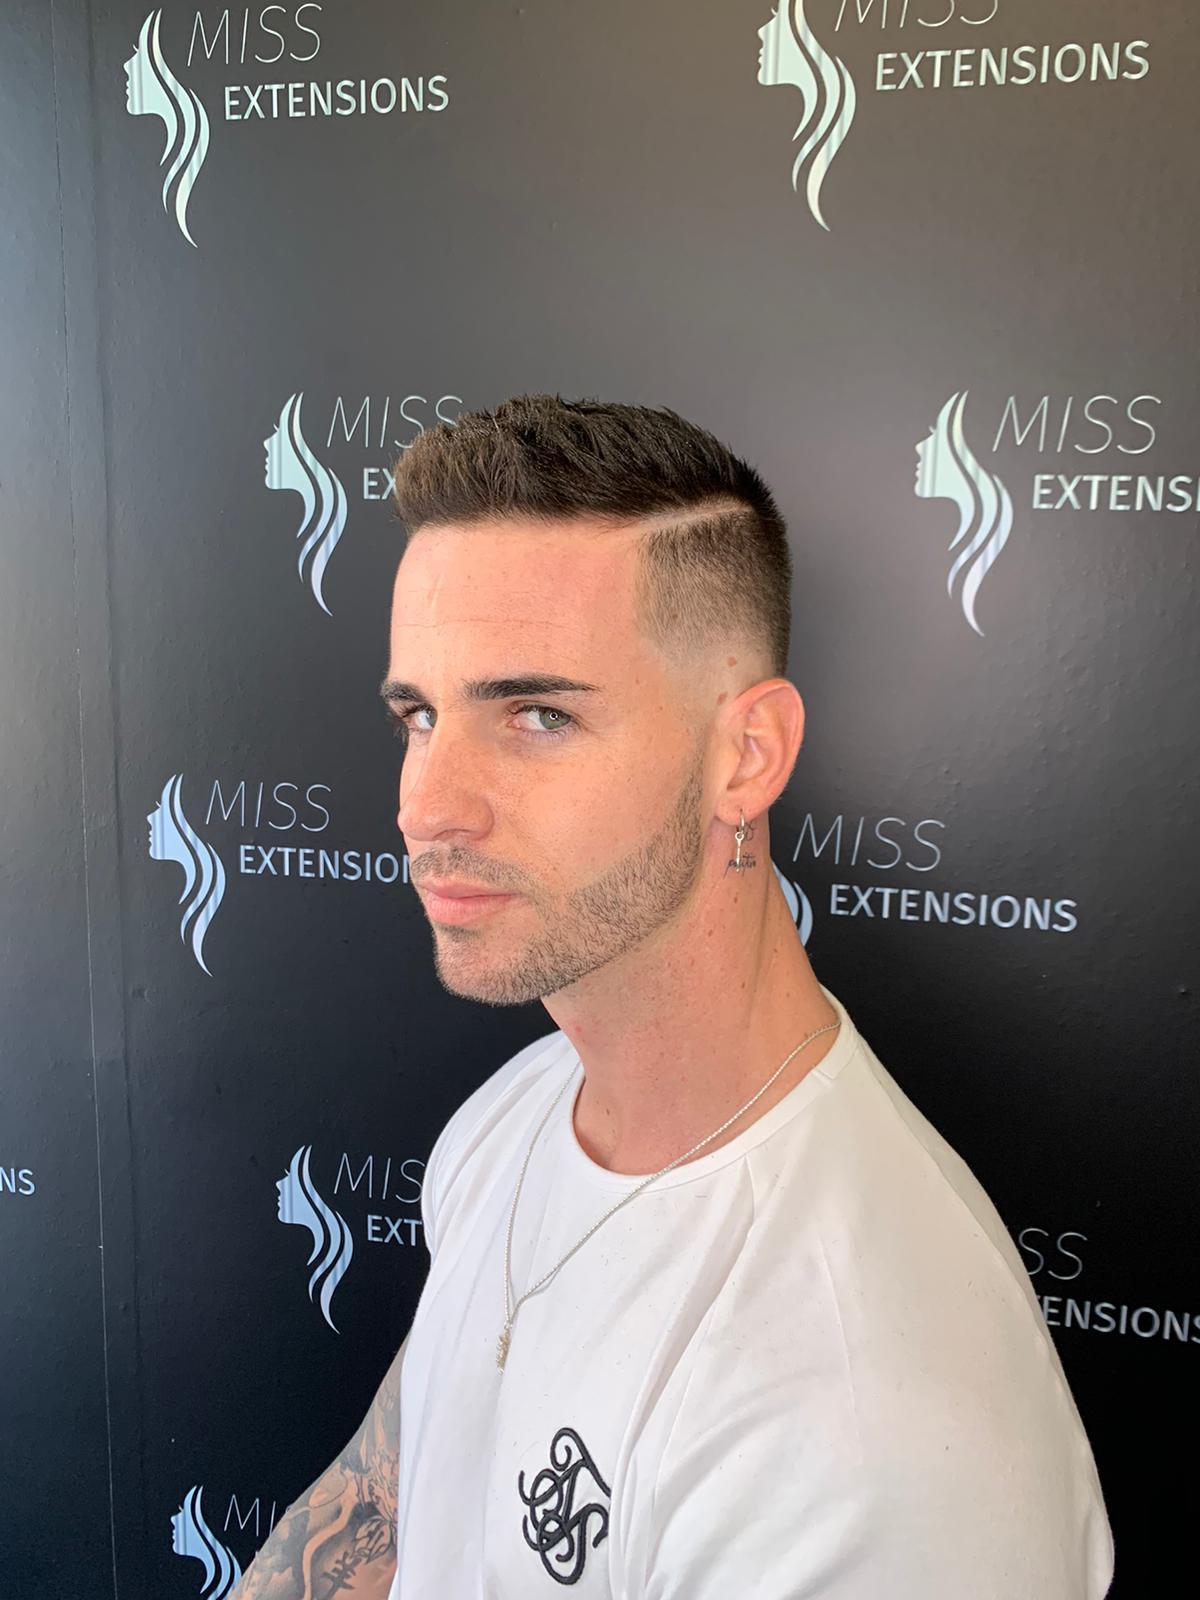 peluquería-hombre-mostoles-miss-extensions